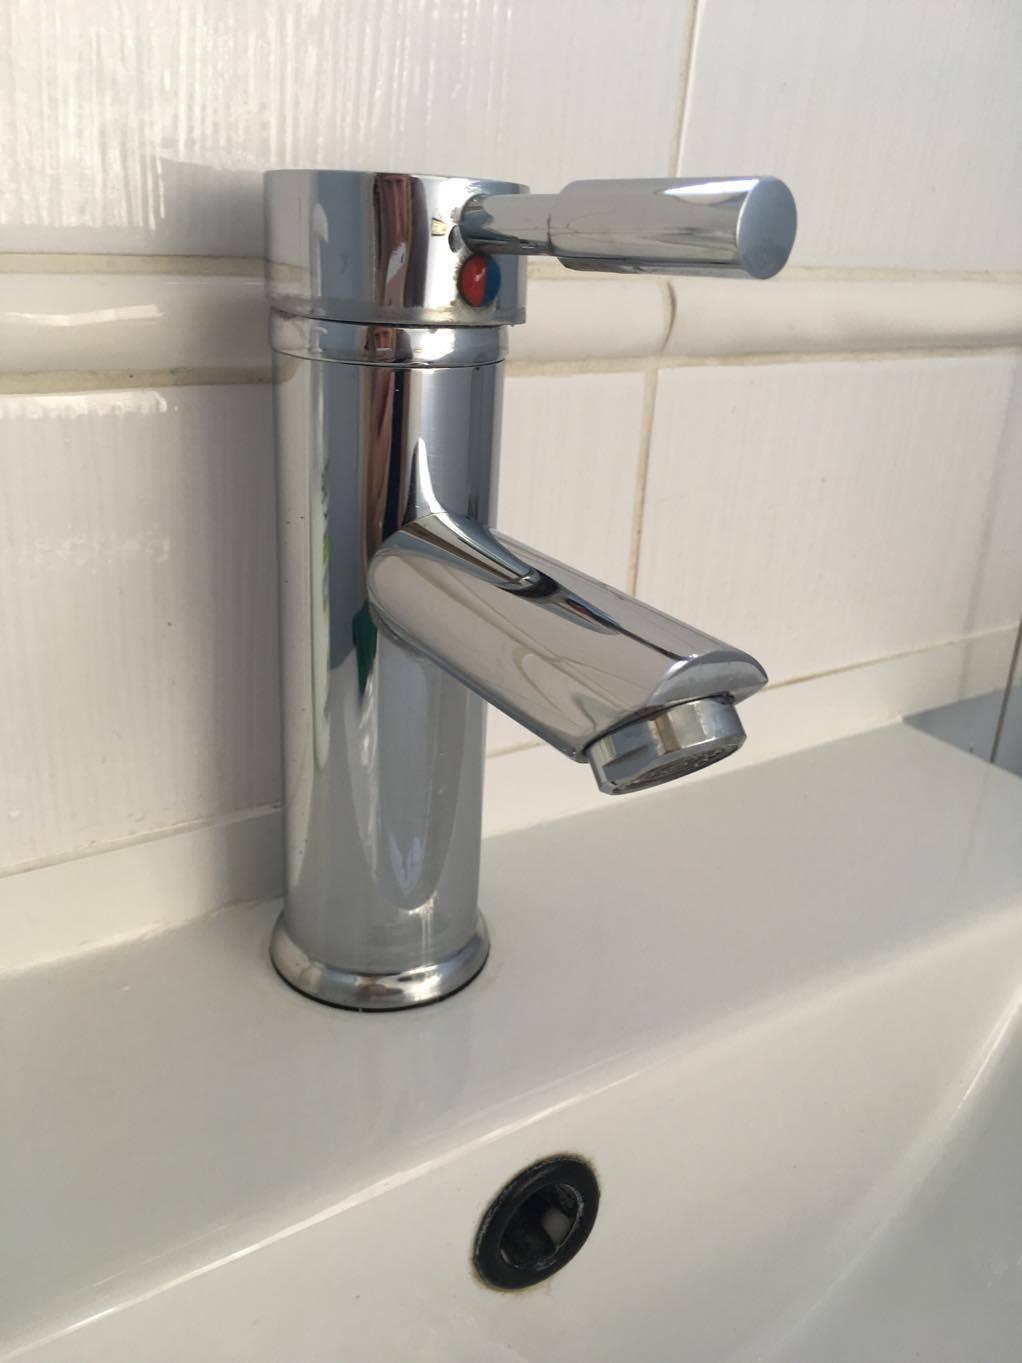 clean tap